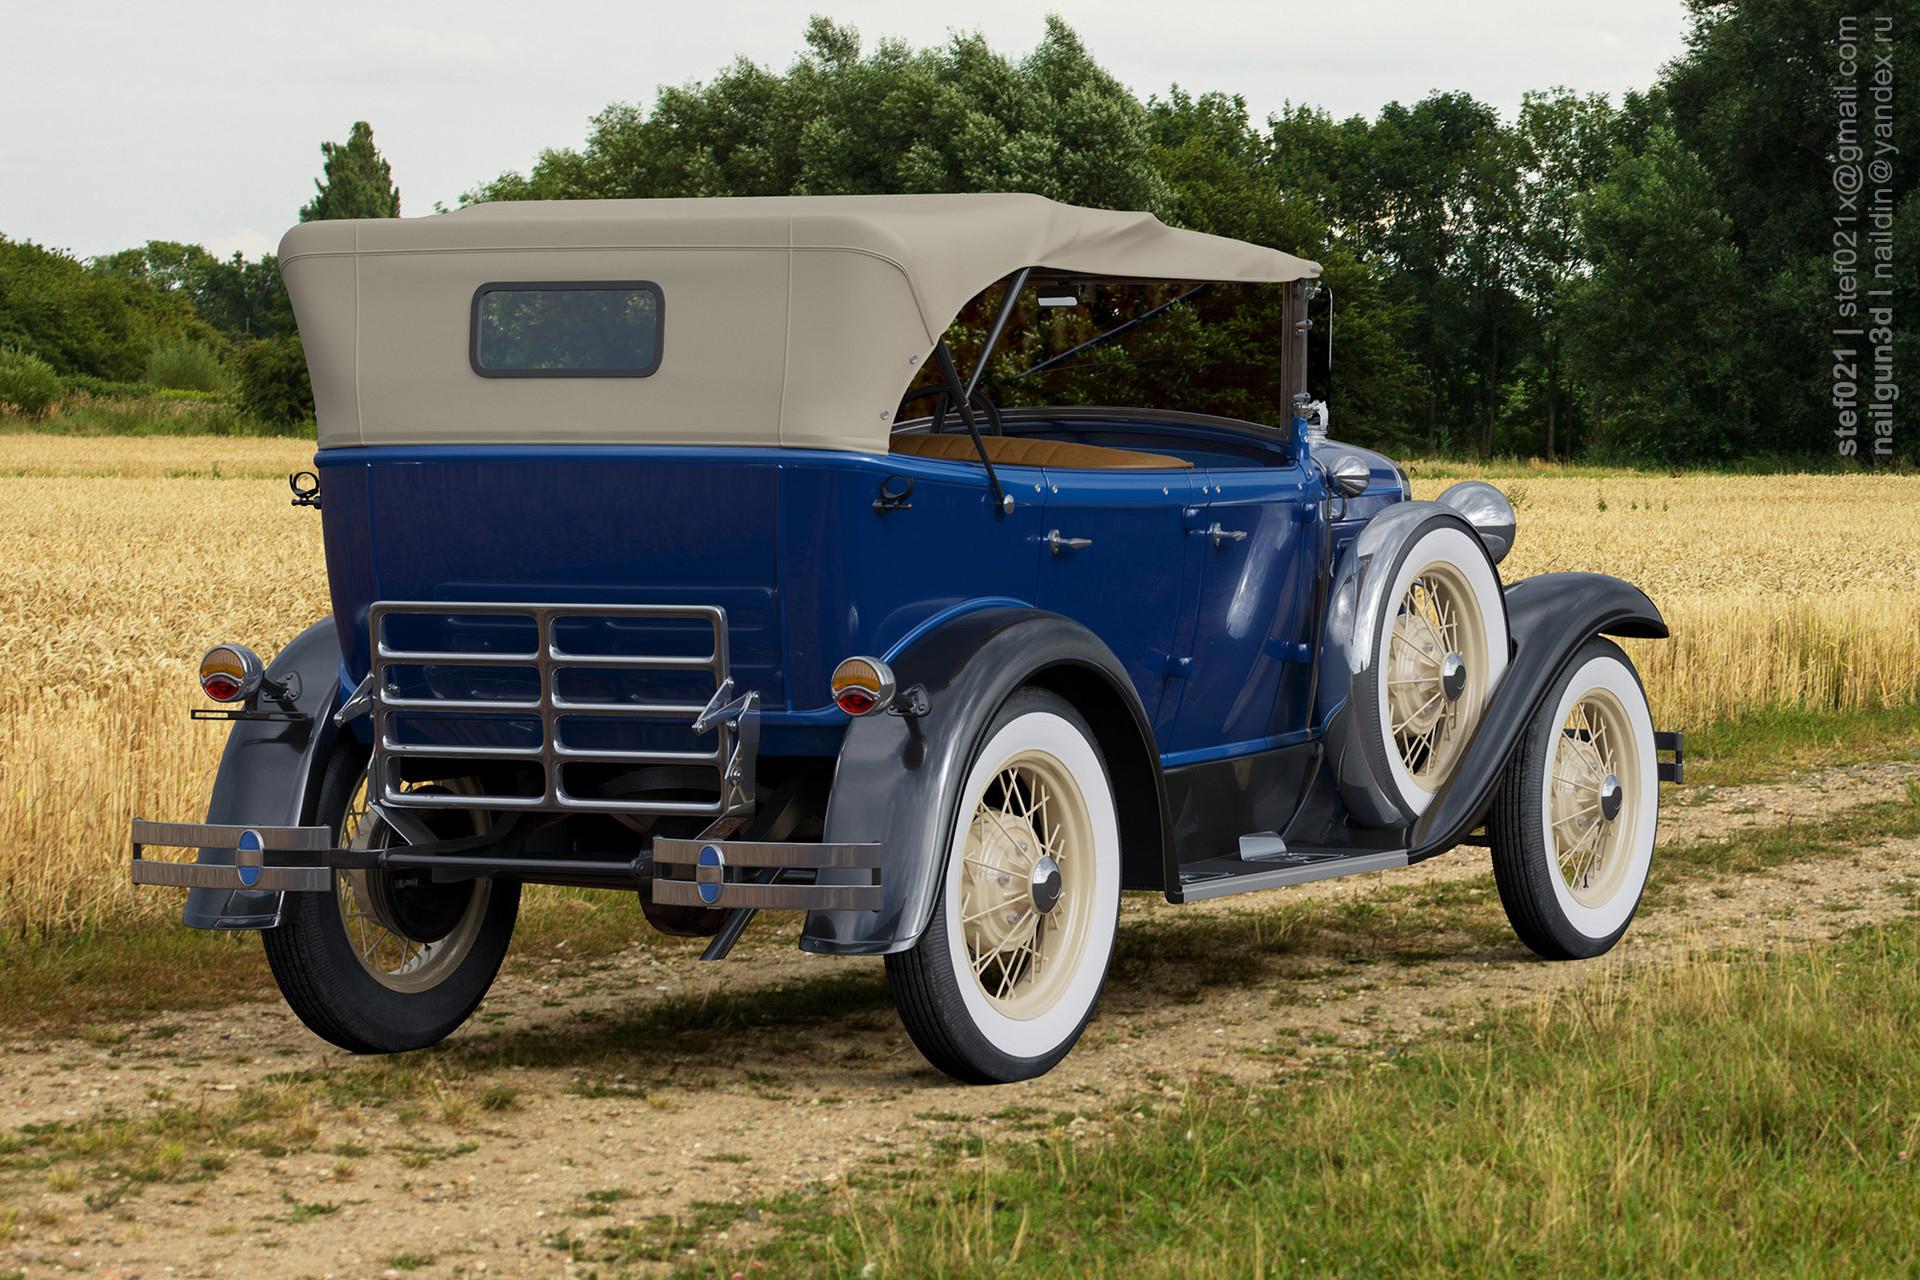 Nail khusnutdinov a0006 ford a phaeton 1931 render 2